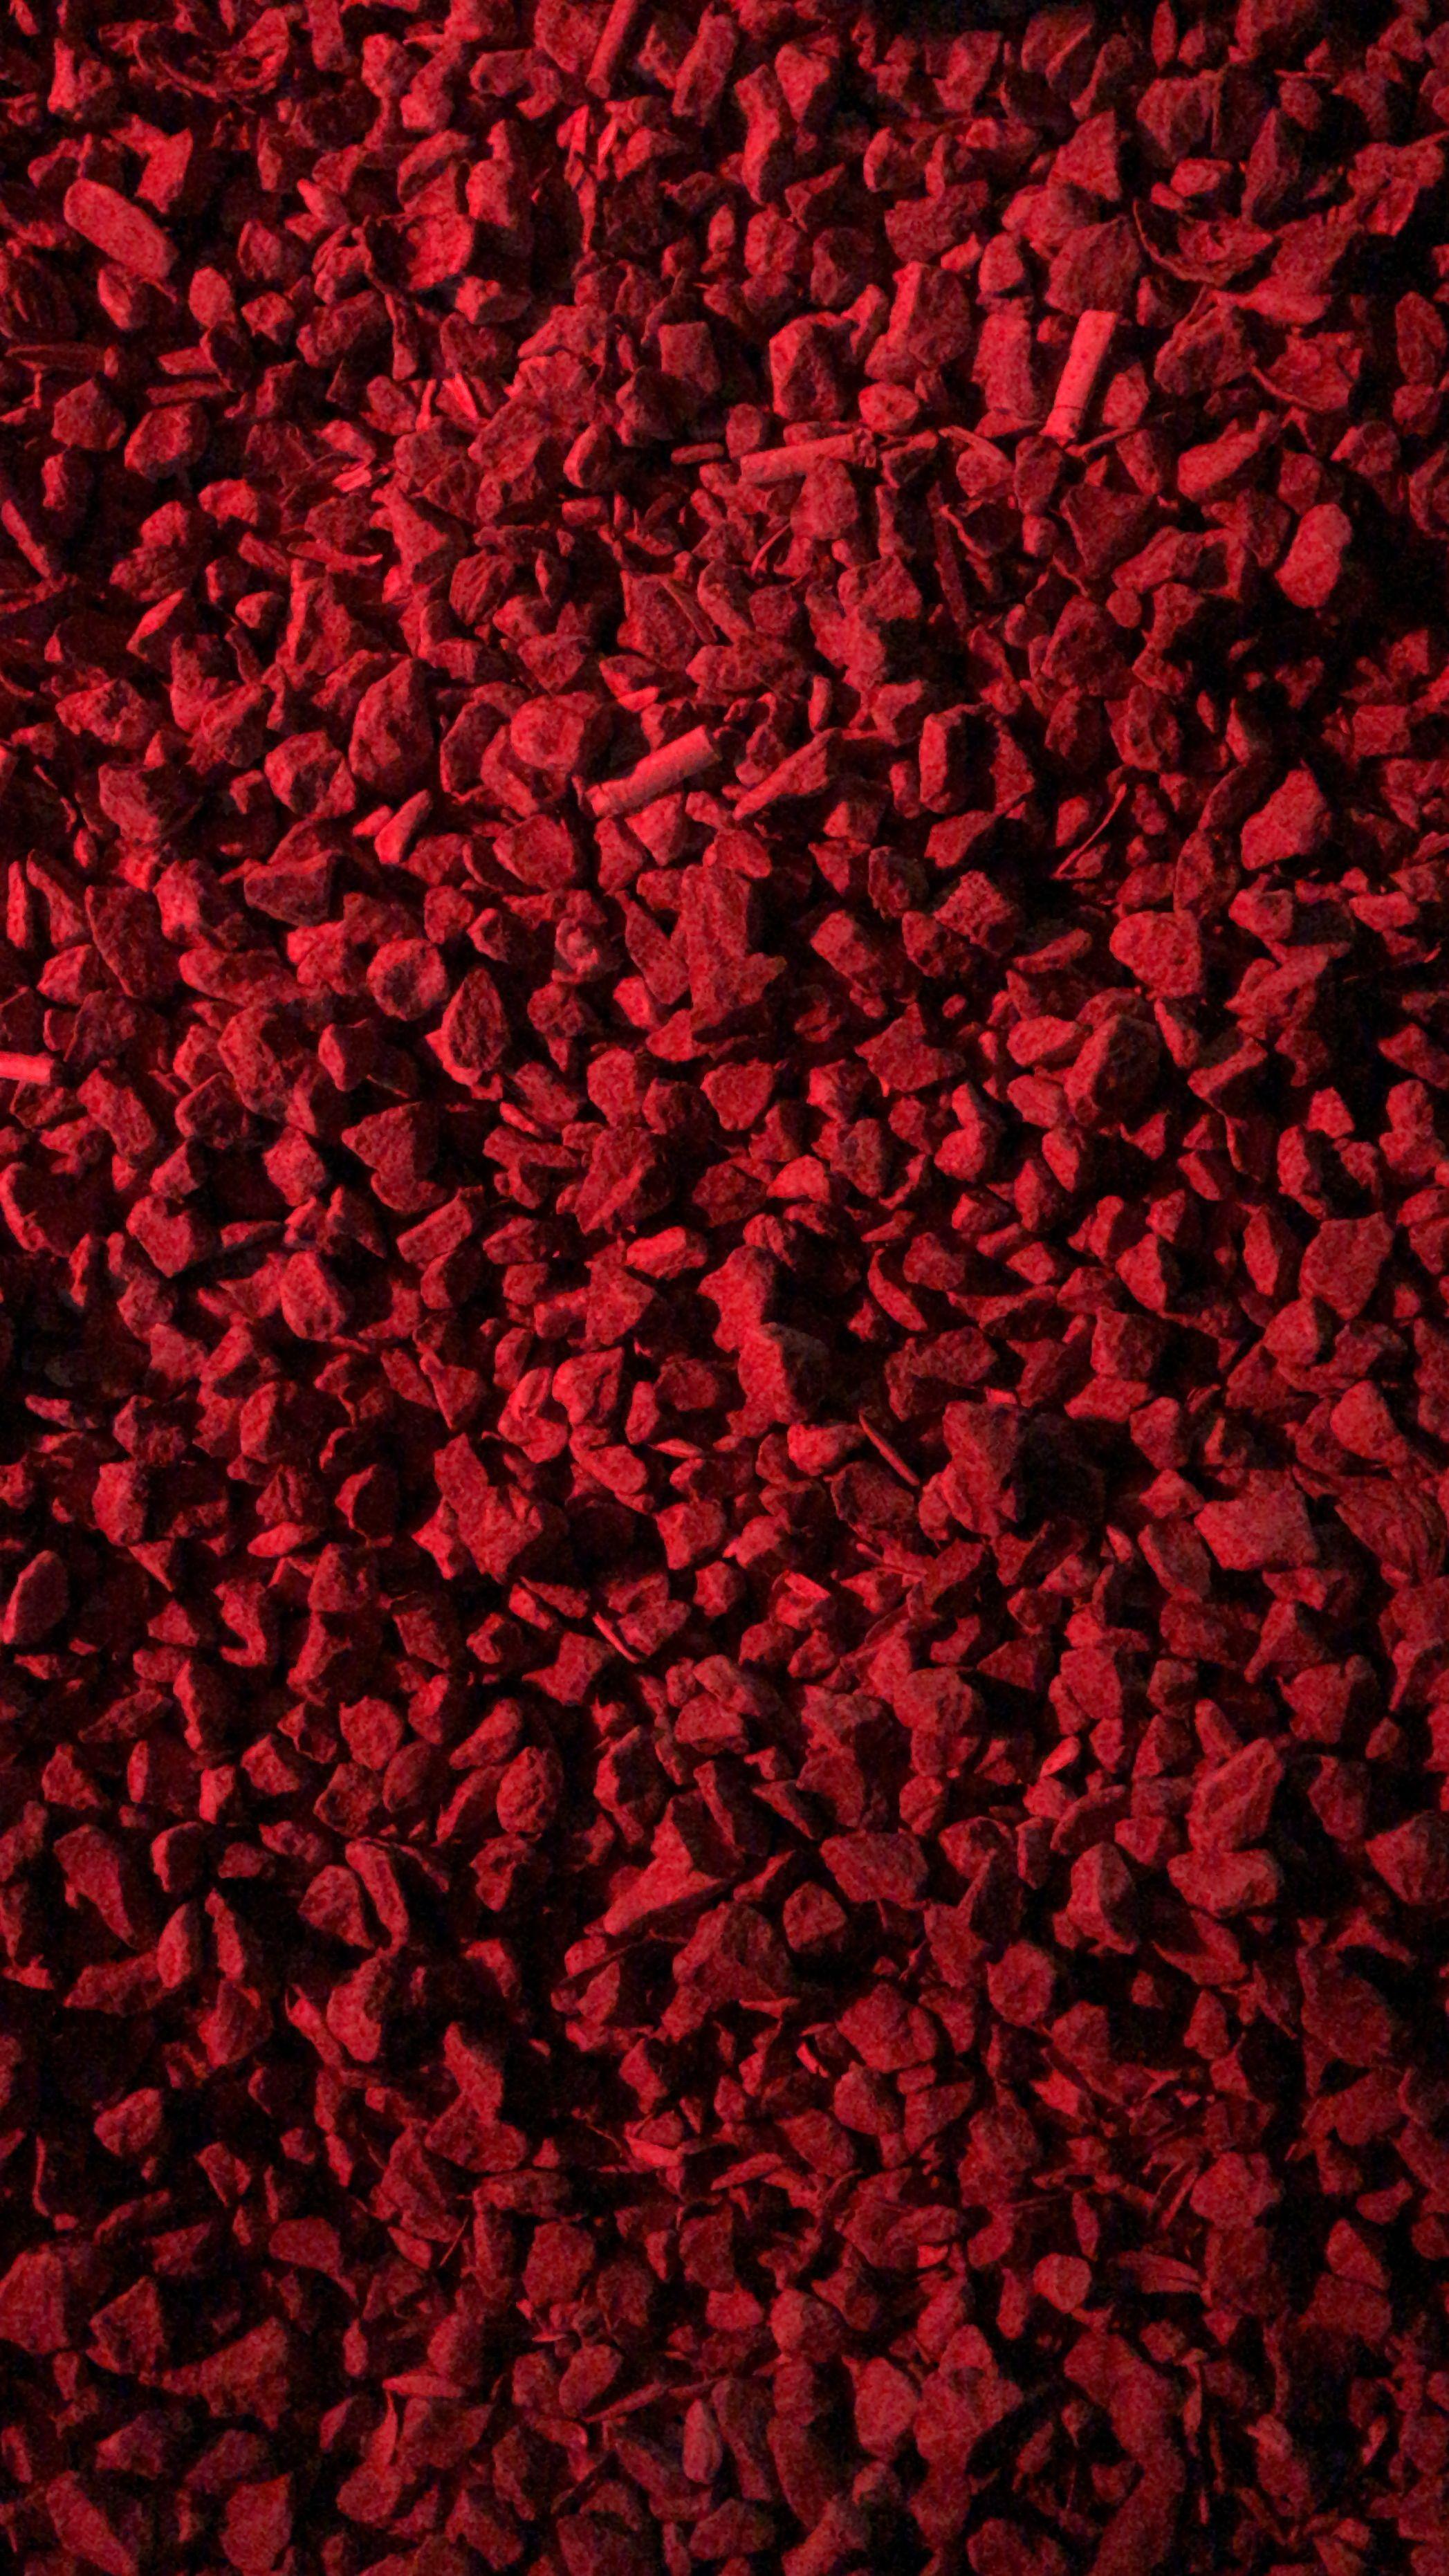 Red Dark Red Tumblr Wallpaper Red Tumblr Wallpaper Wallpaper